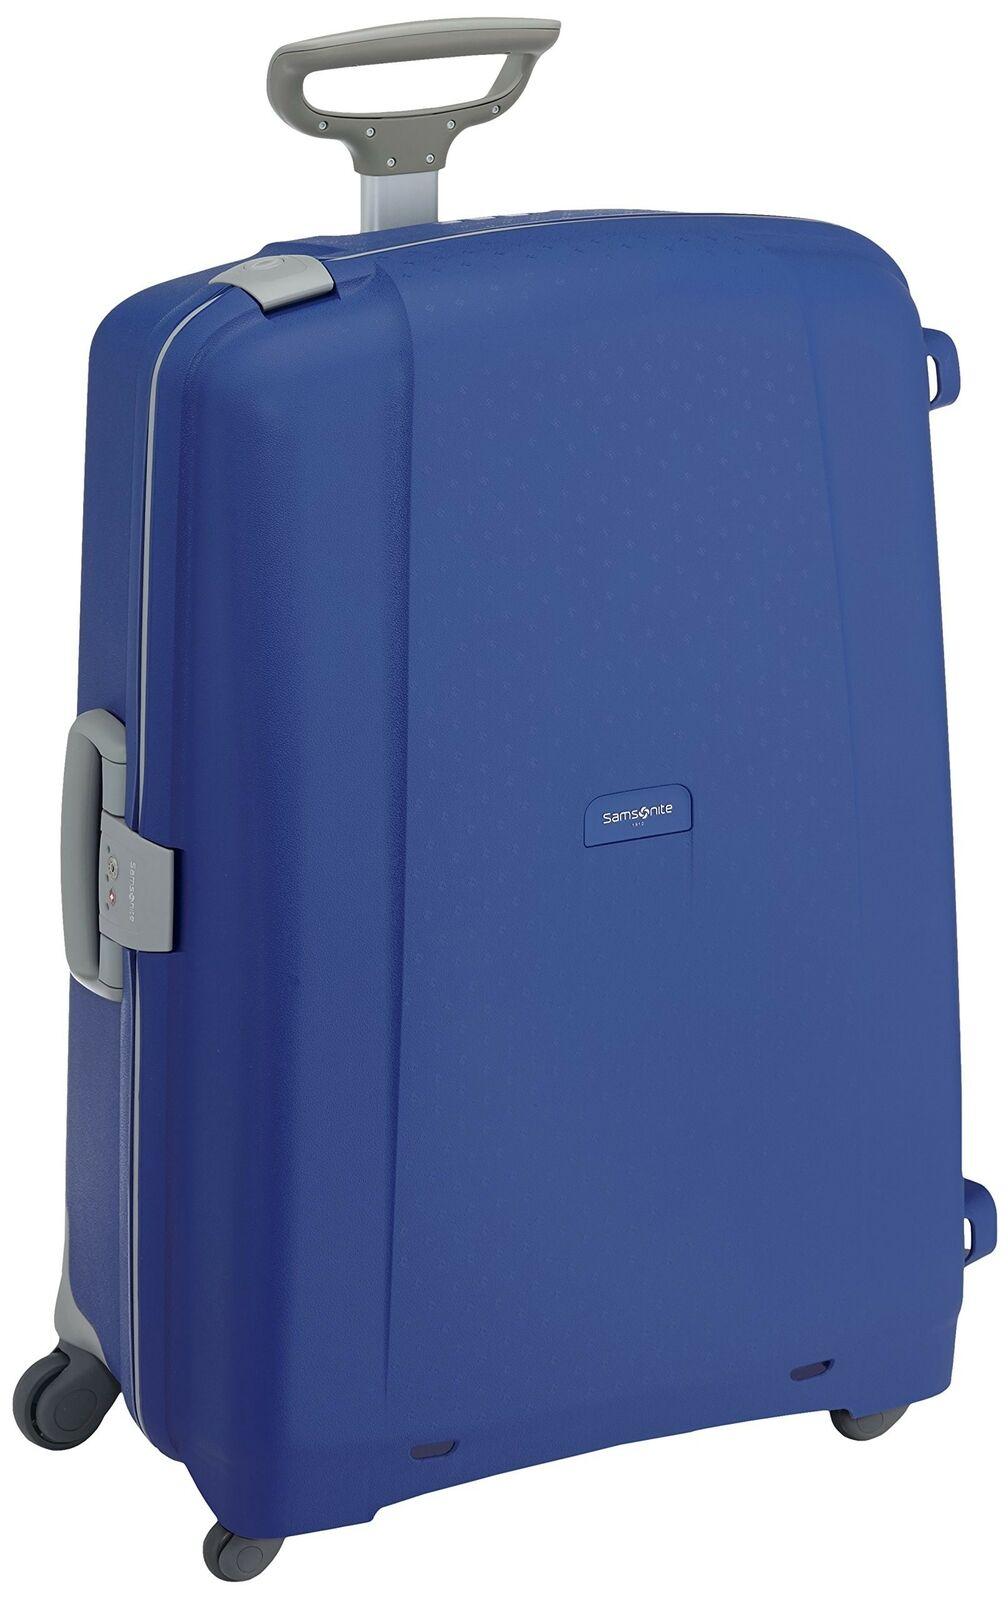 Samsonite Aeris - Spinner 75 - 4,80 Kg, Suitcase 75 cm, 87.5 L, Vivid bleu